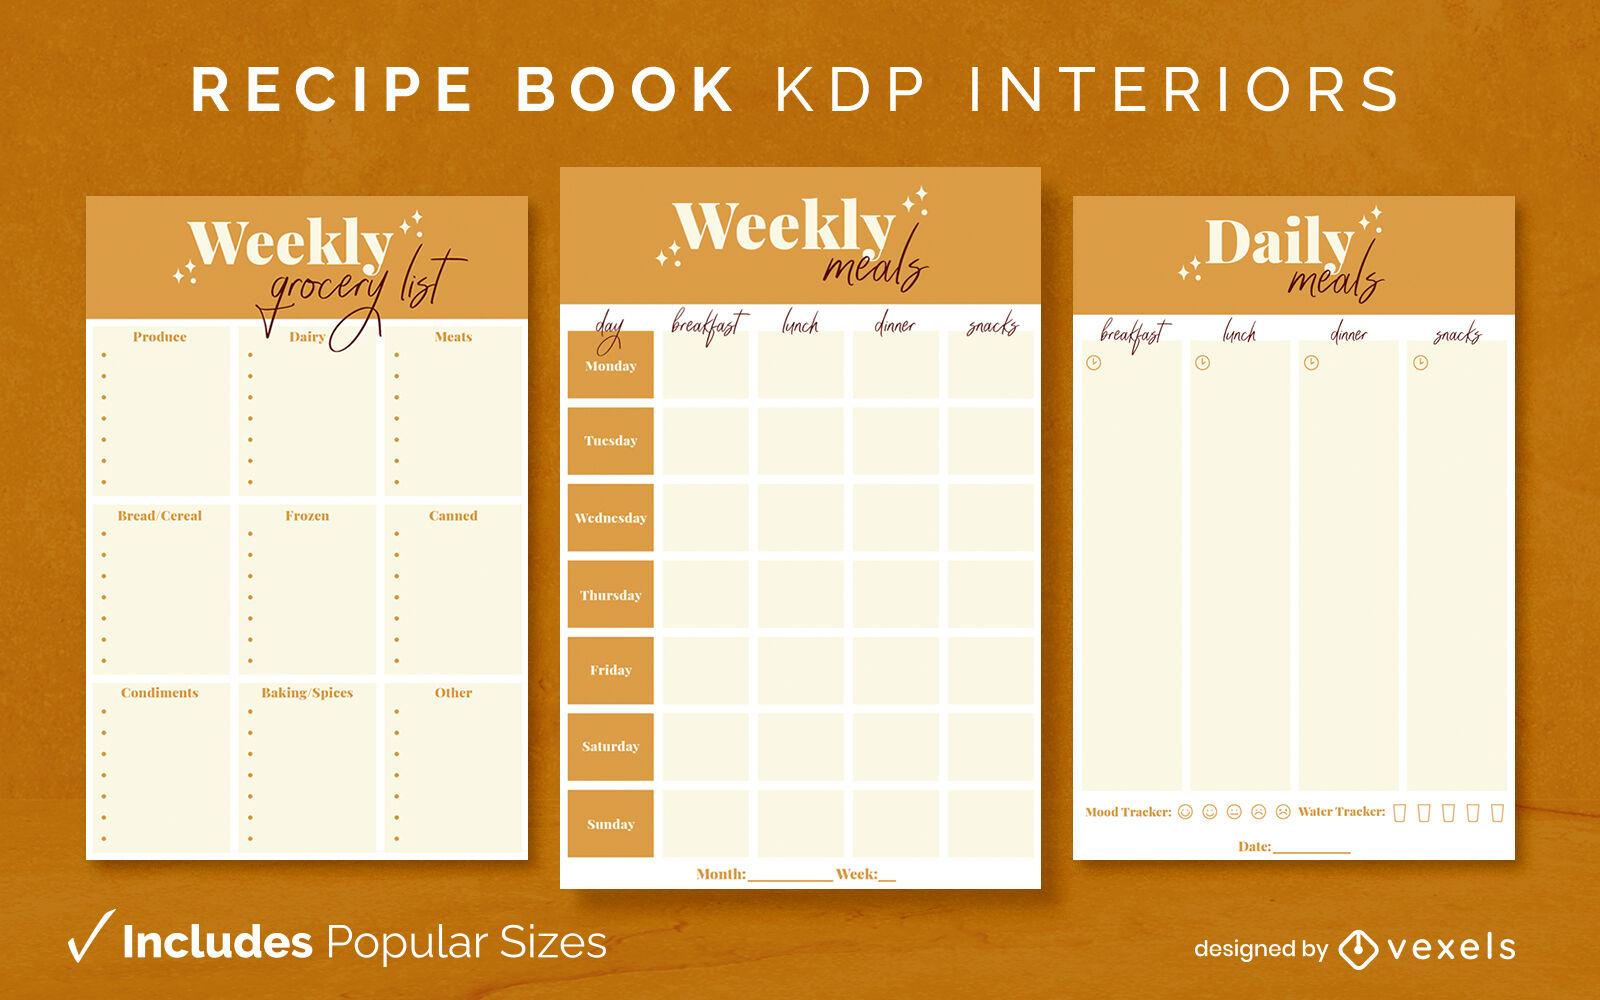 Sparkly recipe book design template KDP